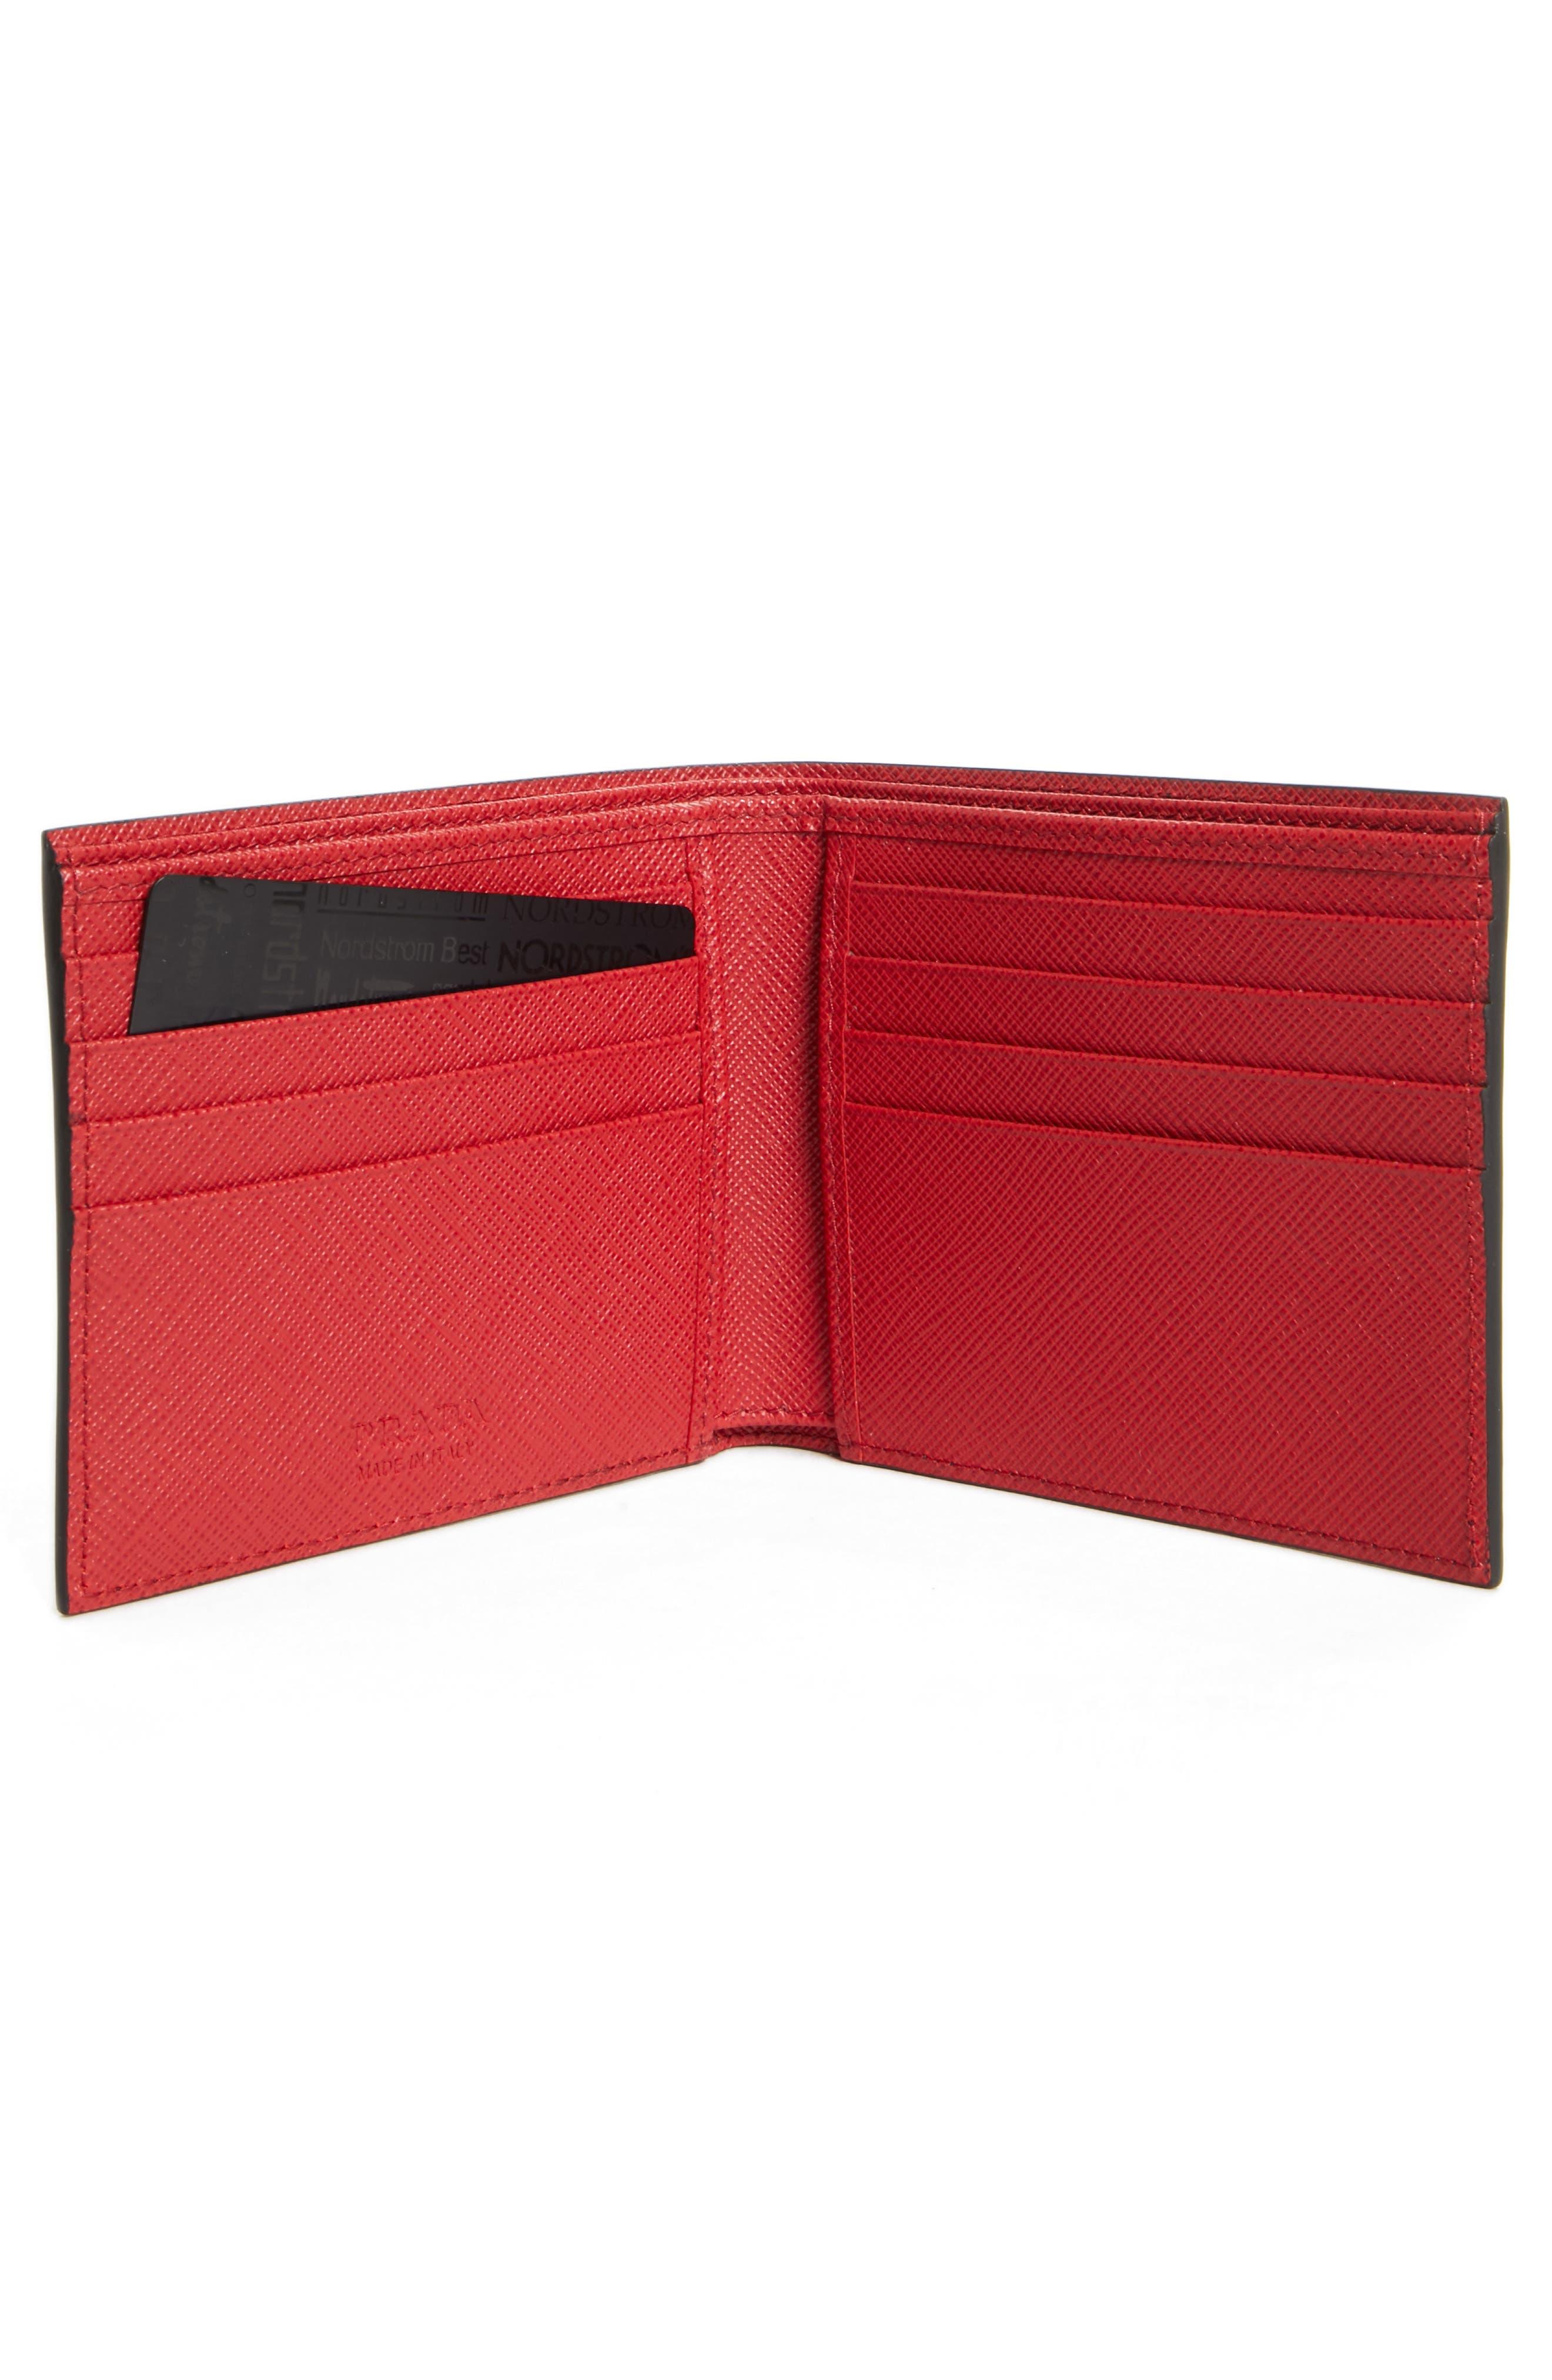 Bicolor Leather Wallet,                             Alternate thumbnail 2, color,                             001